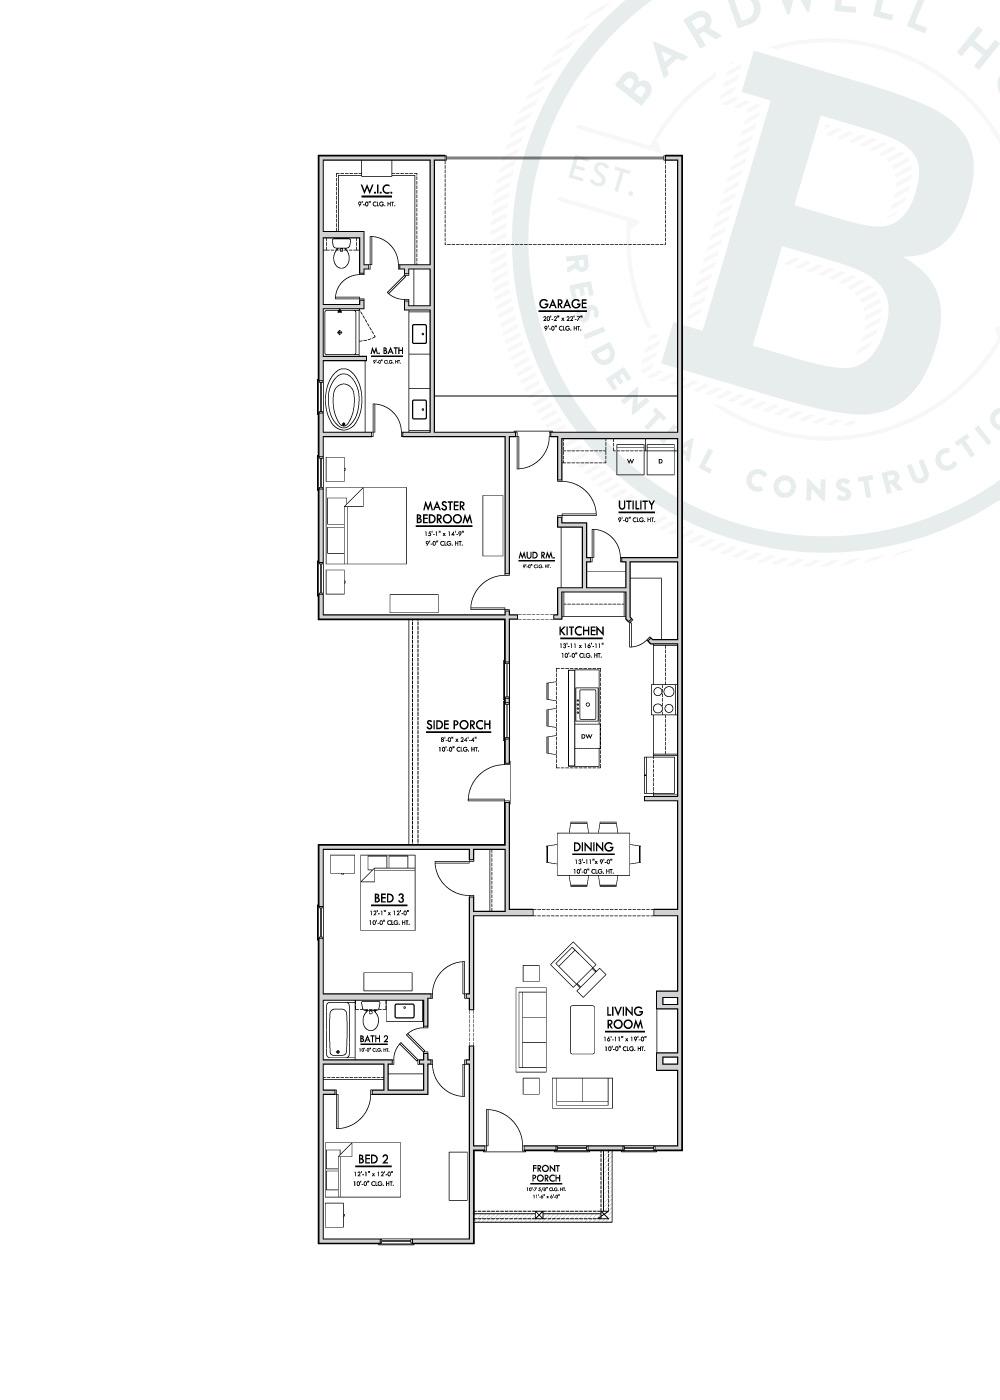 Toulouse-B_Floorplan_4.26.19